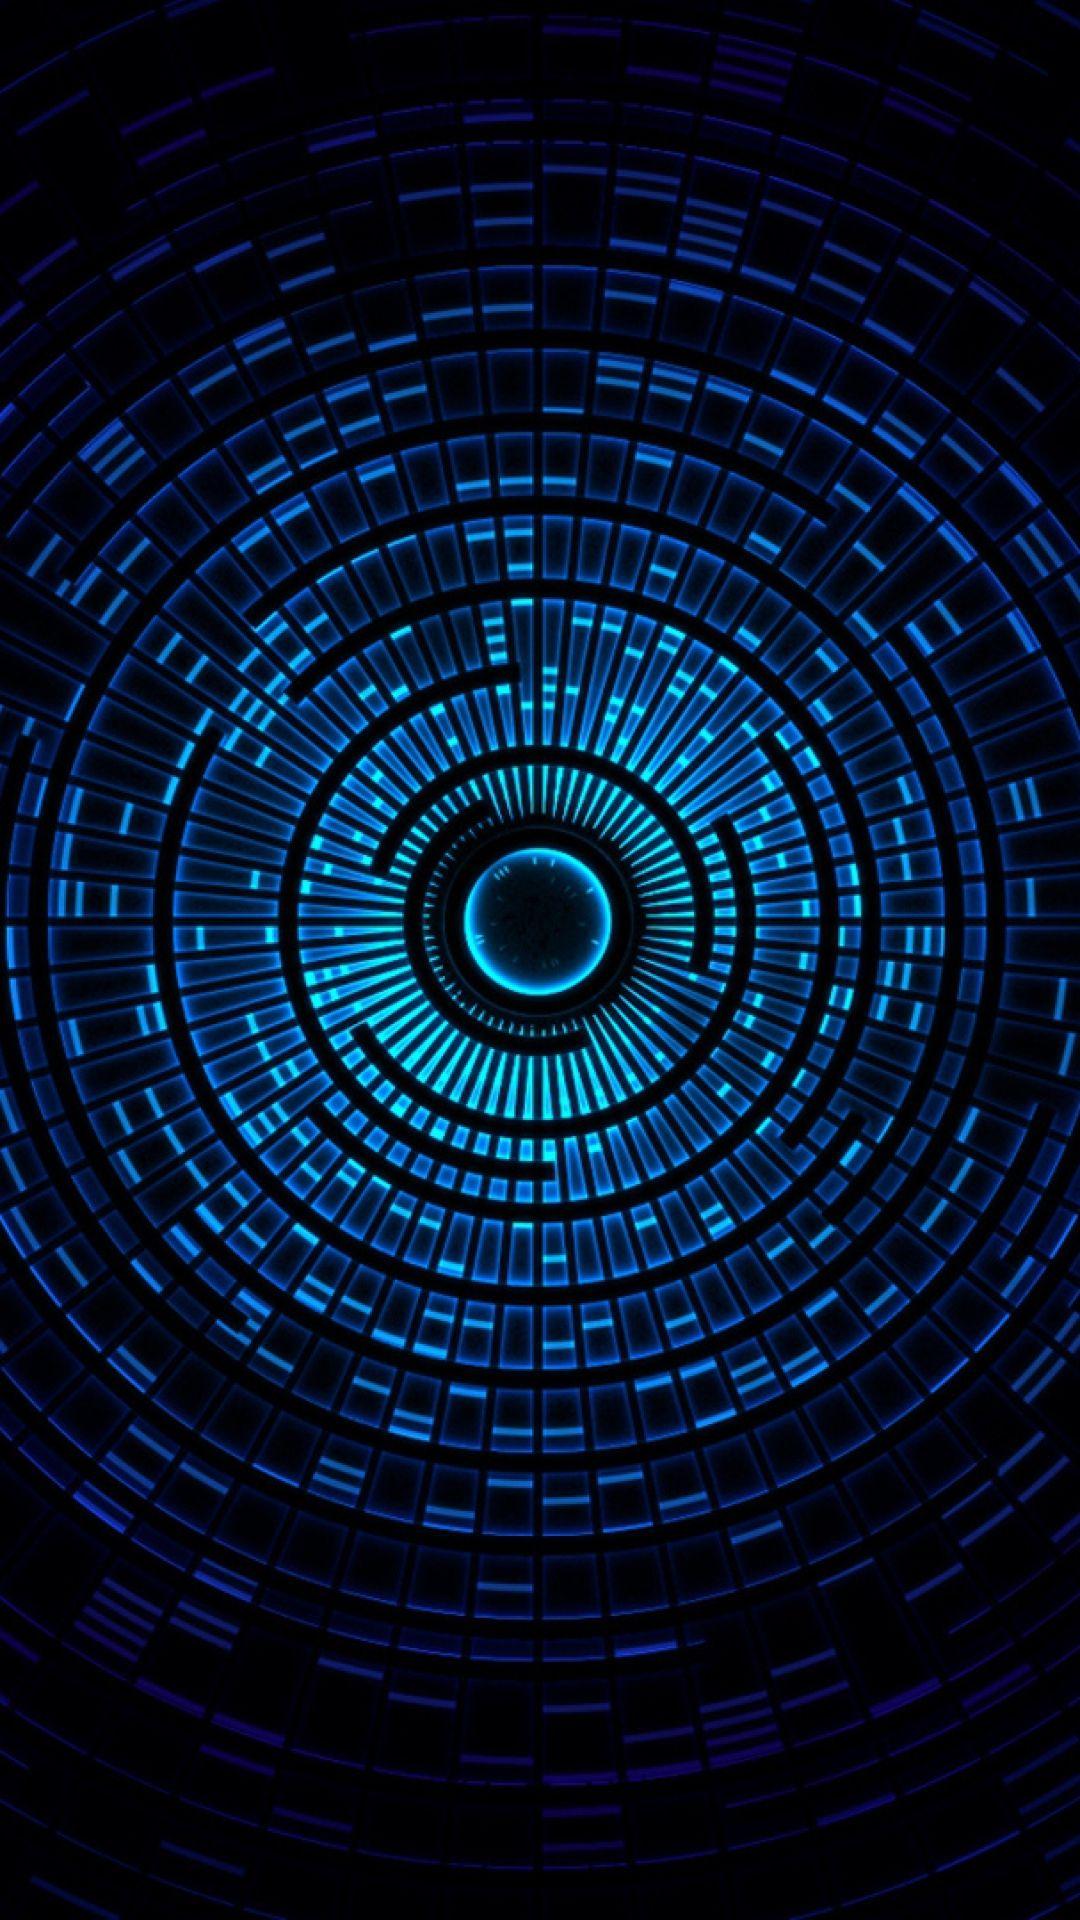 hd background blue circle